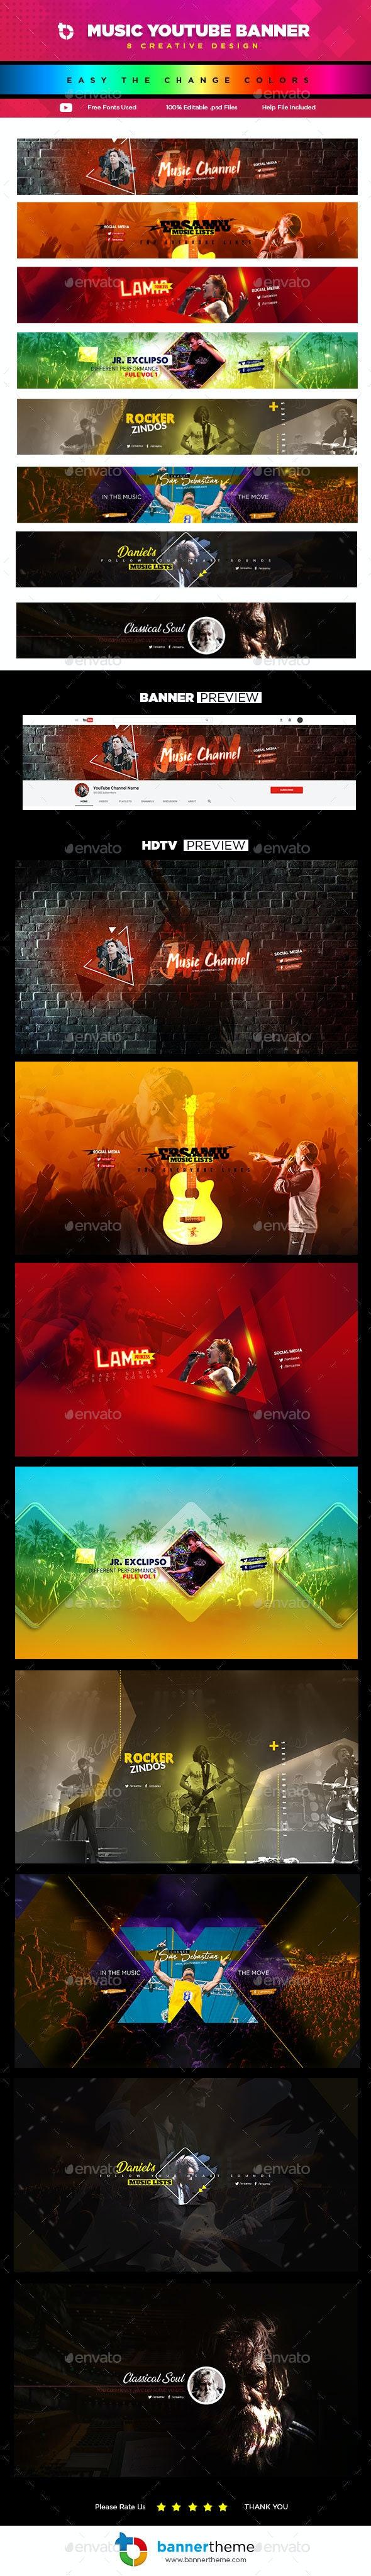 8 Creative Music YouTube Banners - YouTube Social Media